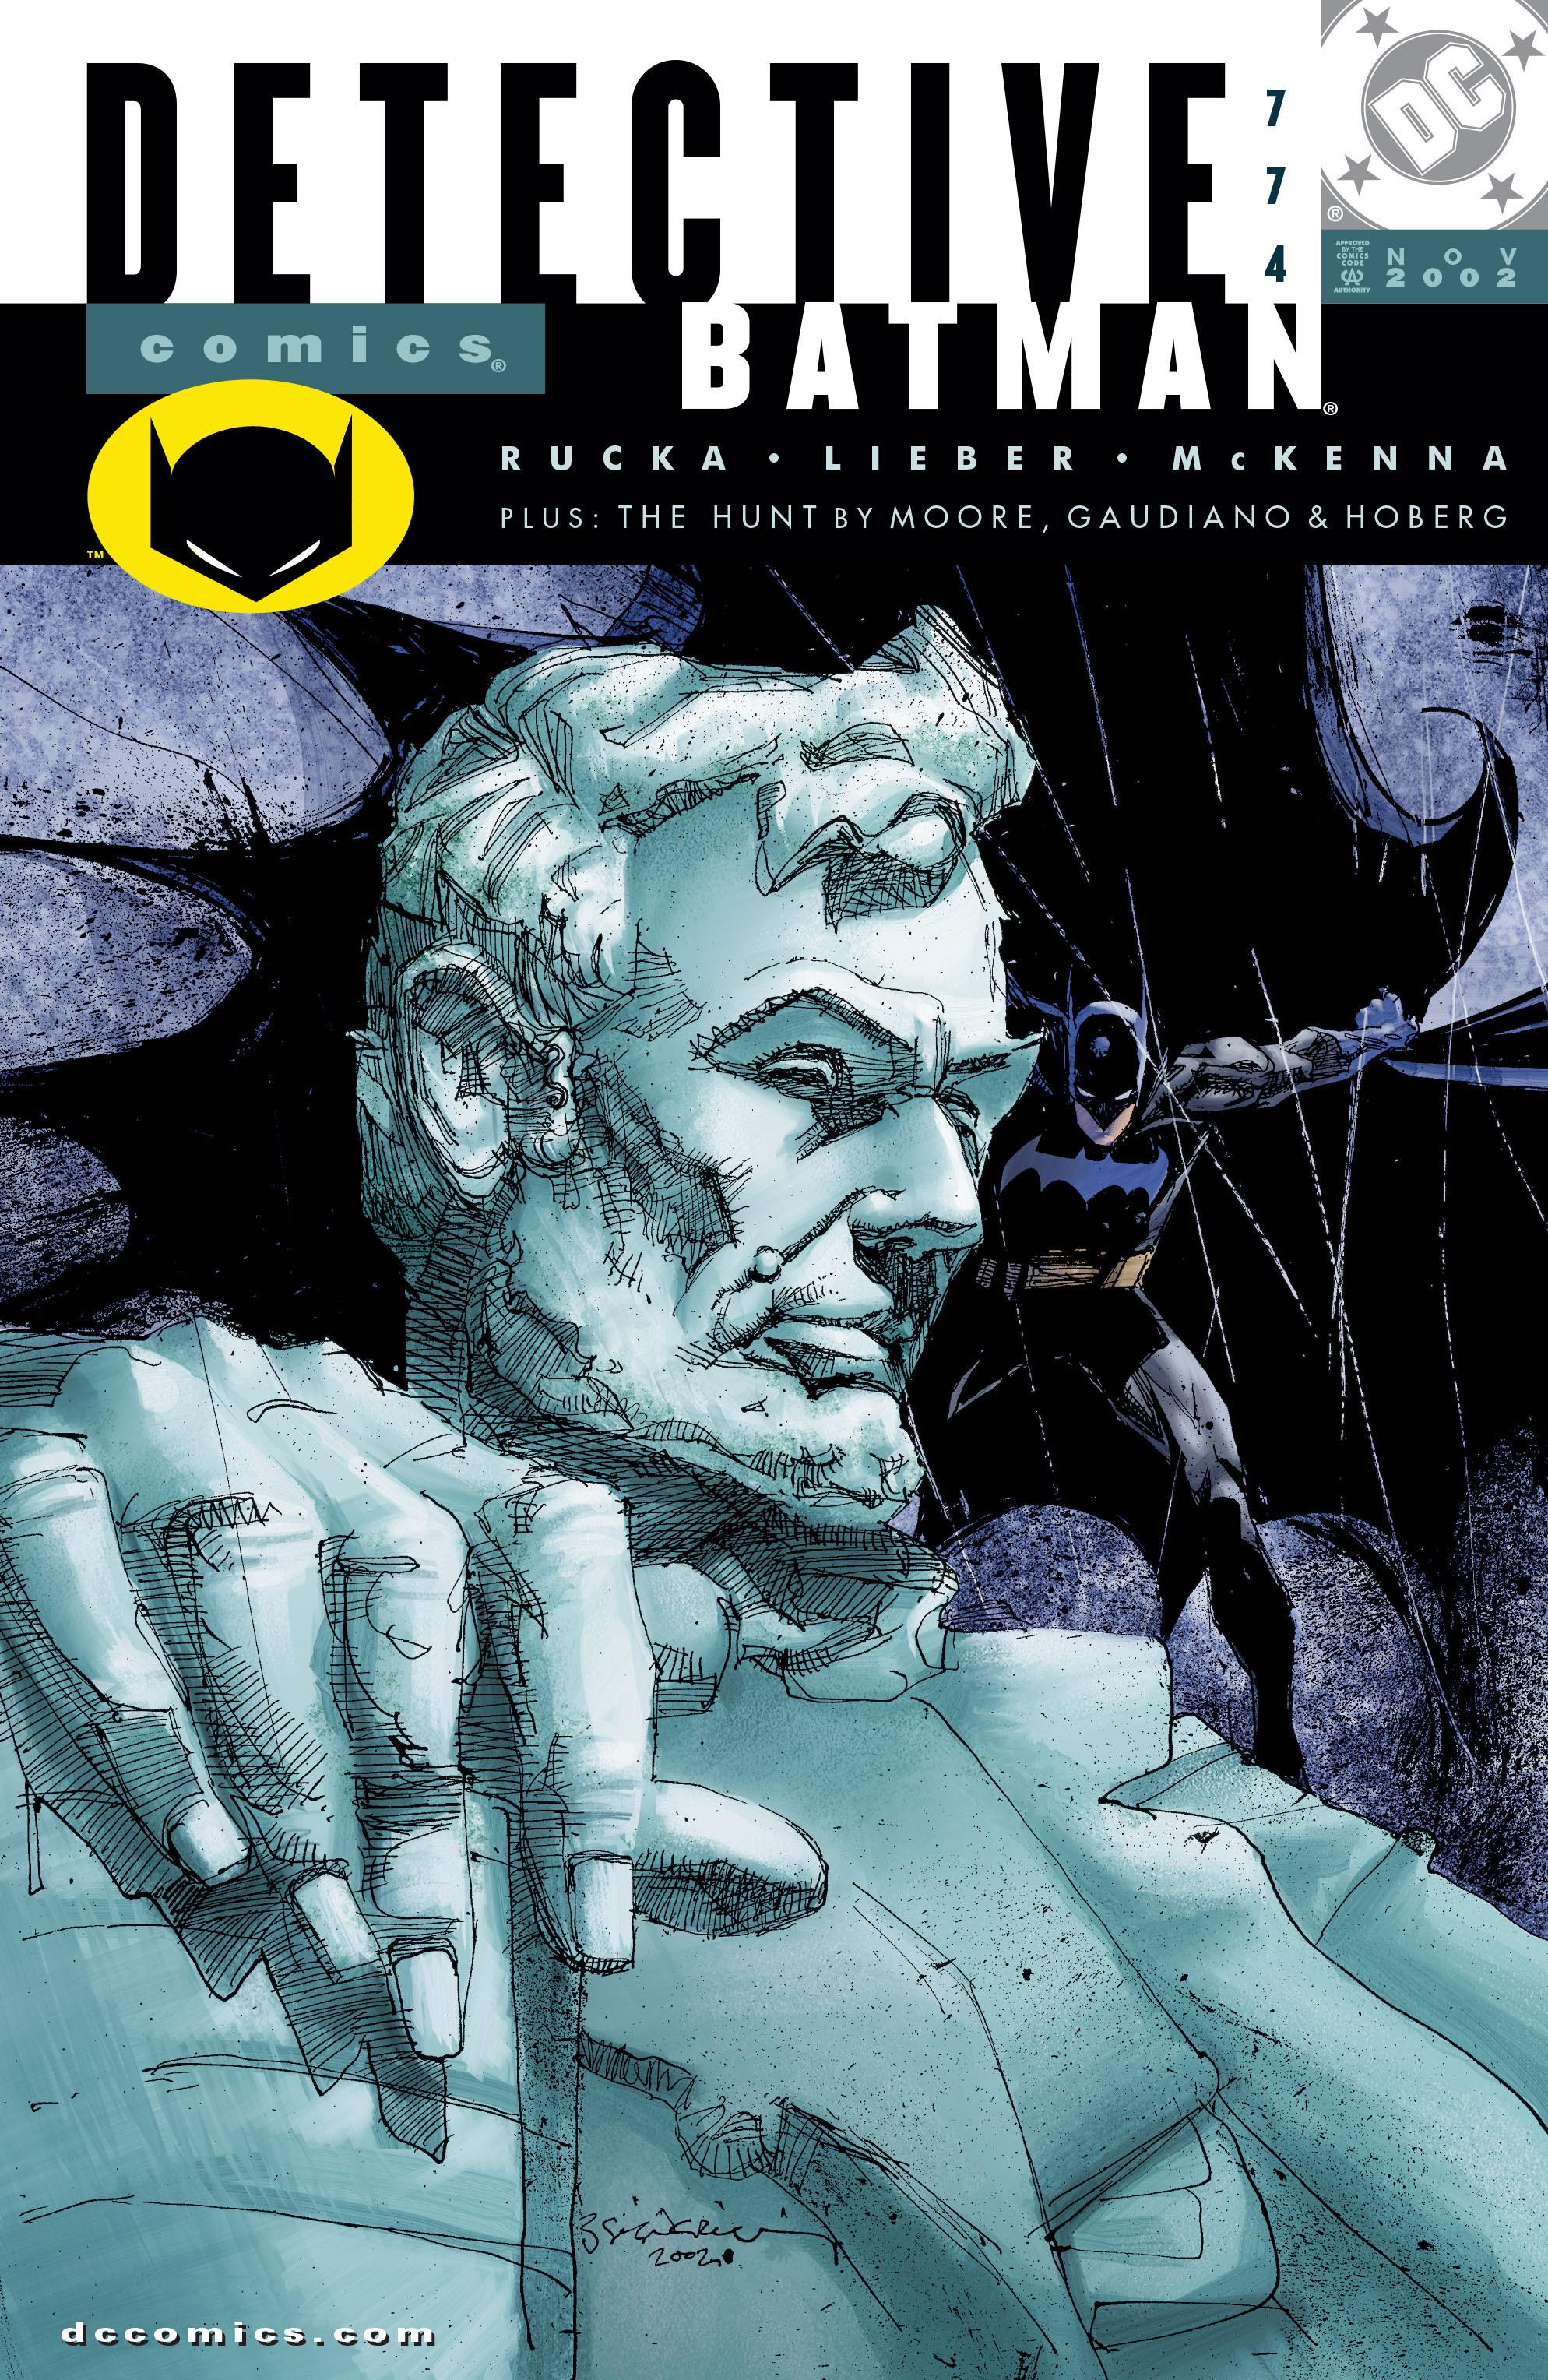 Detective Comics (1937) 774 Page 0